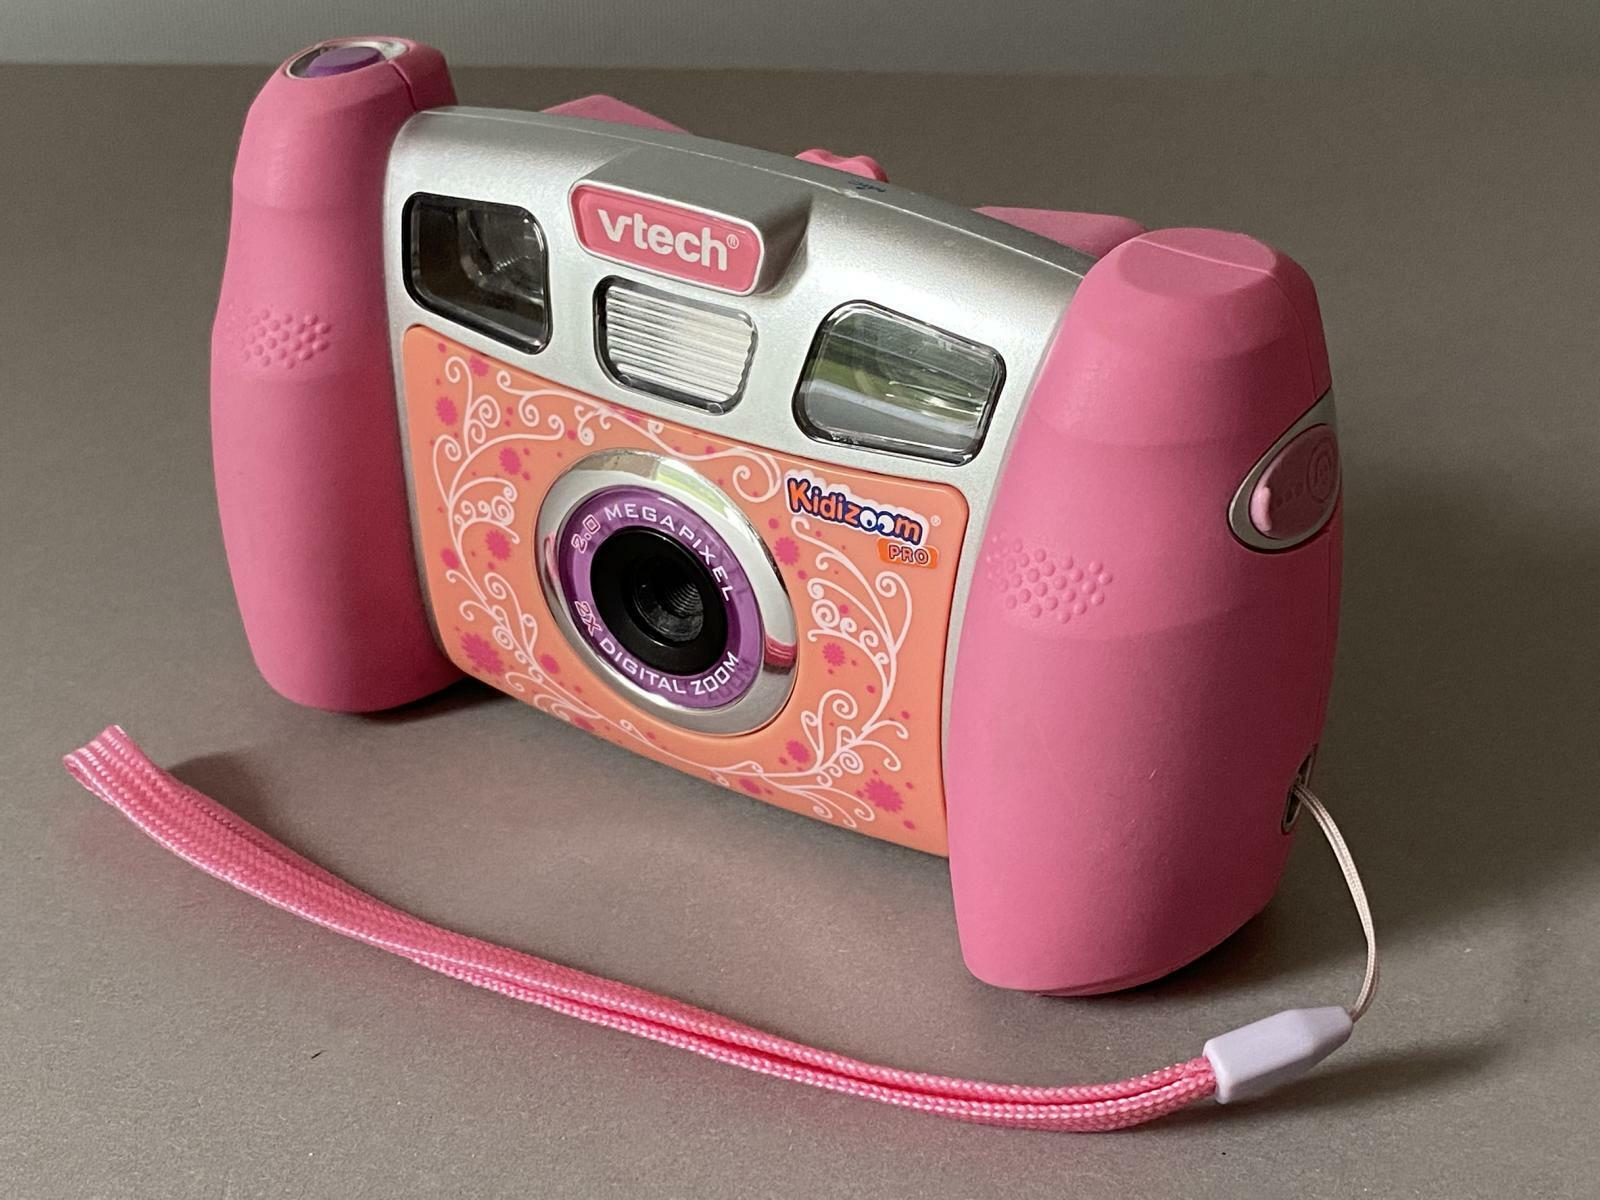 KIDIZOOM Pro vtech Digital-Kamera für Kinder, Speicher, 10 Min Film,Video-Spiele